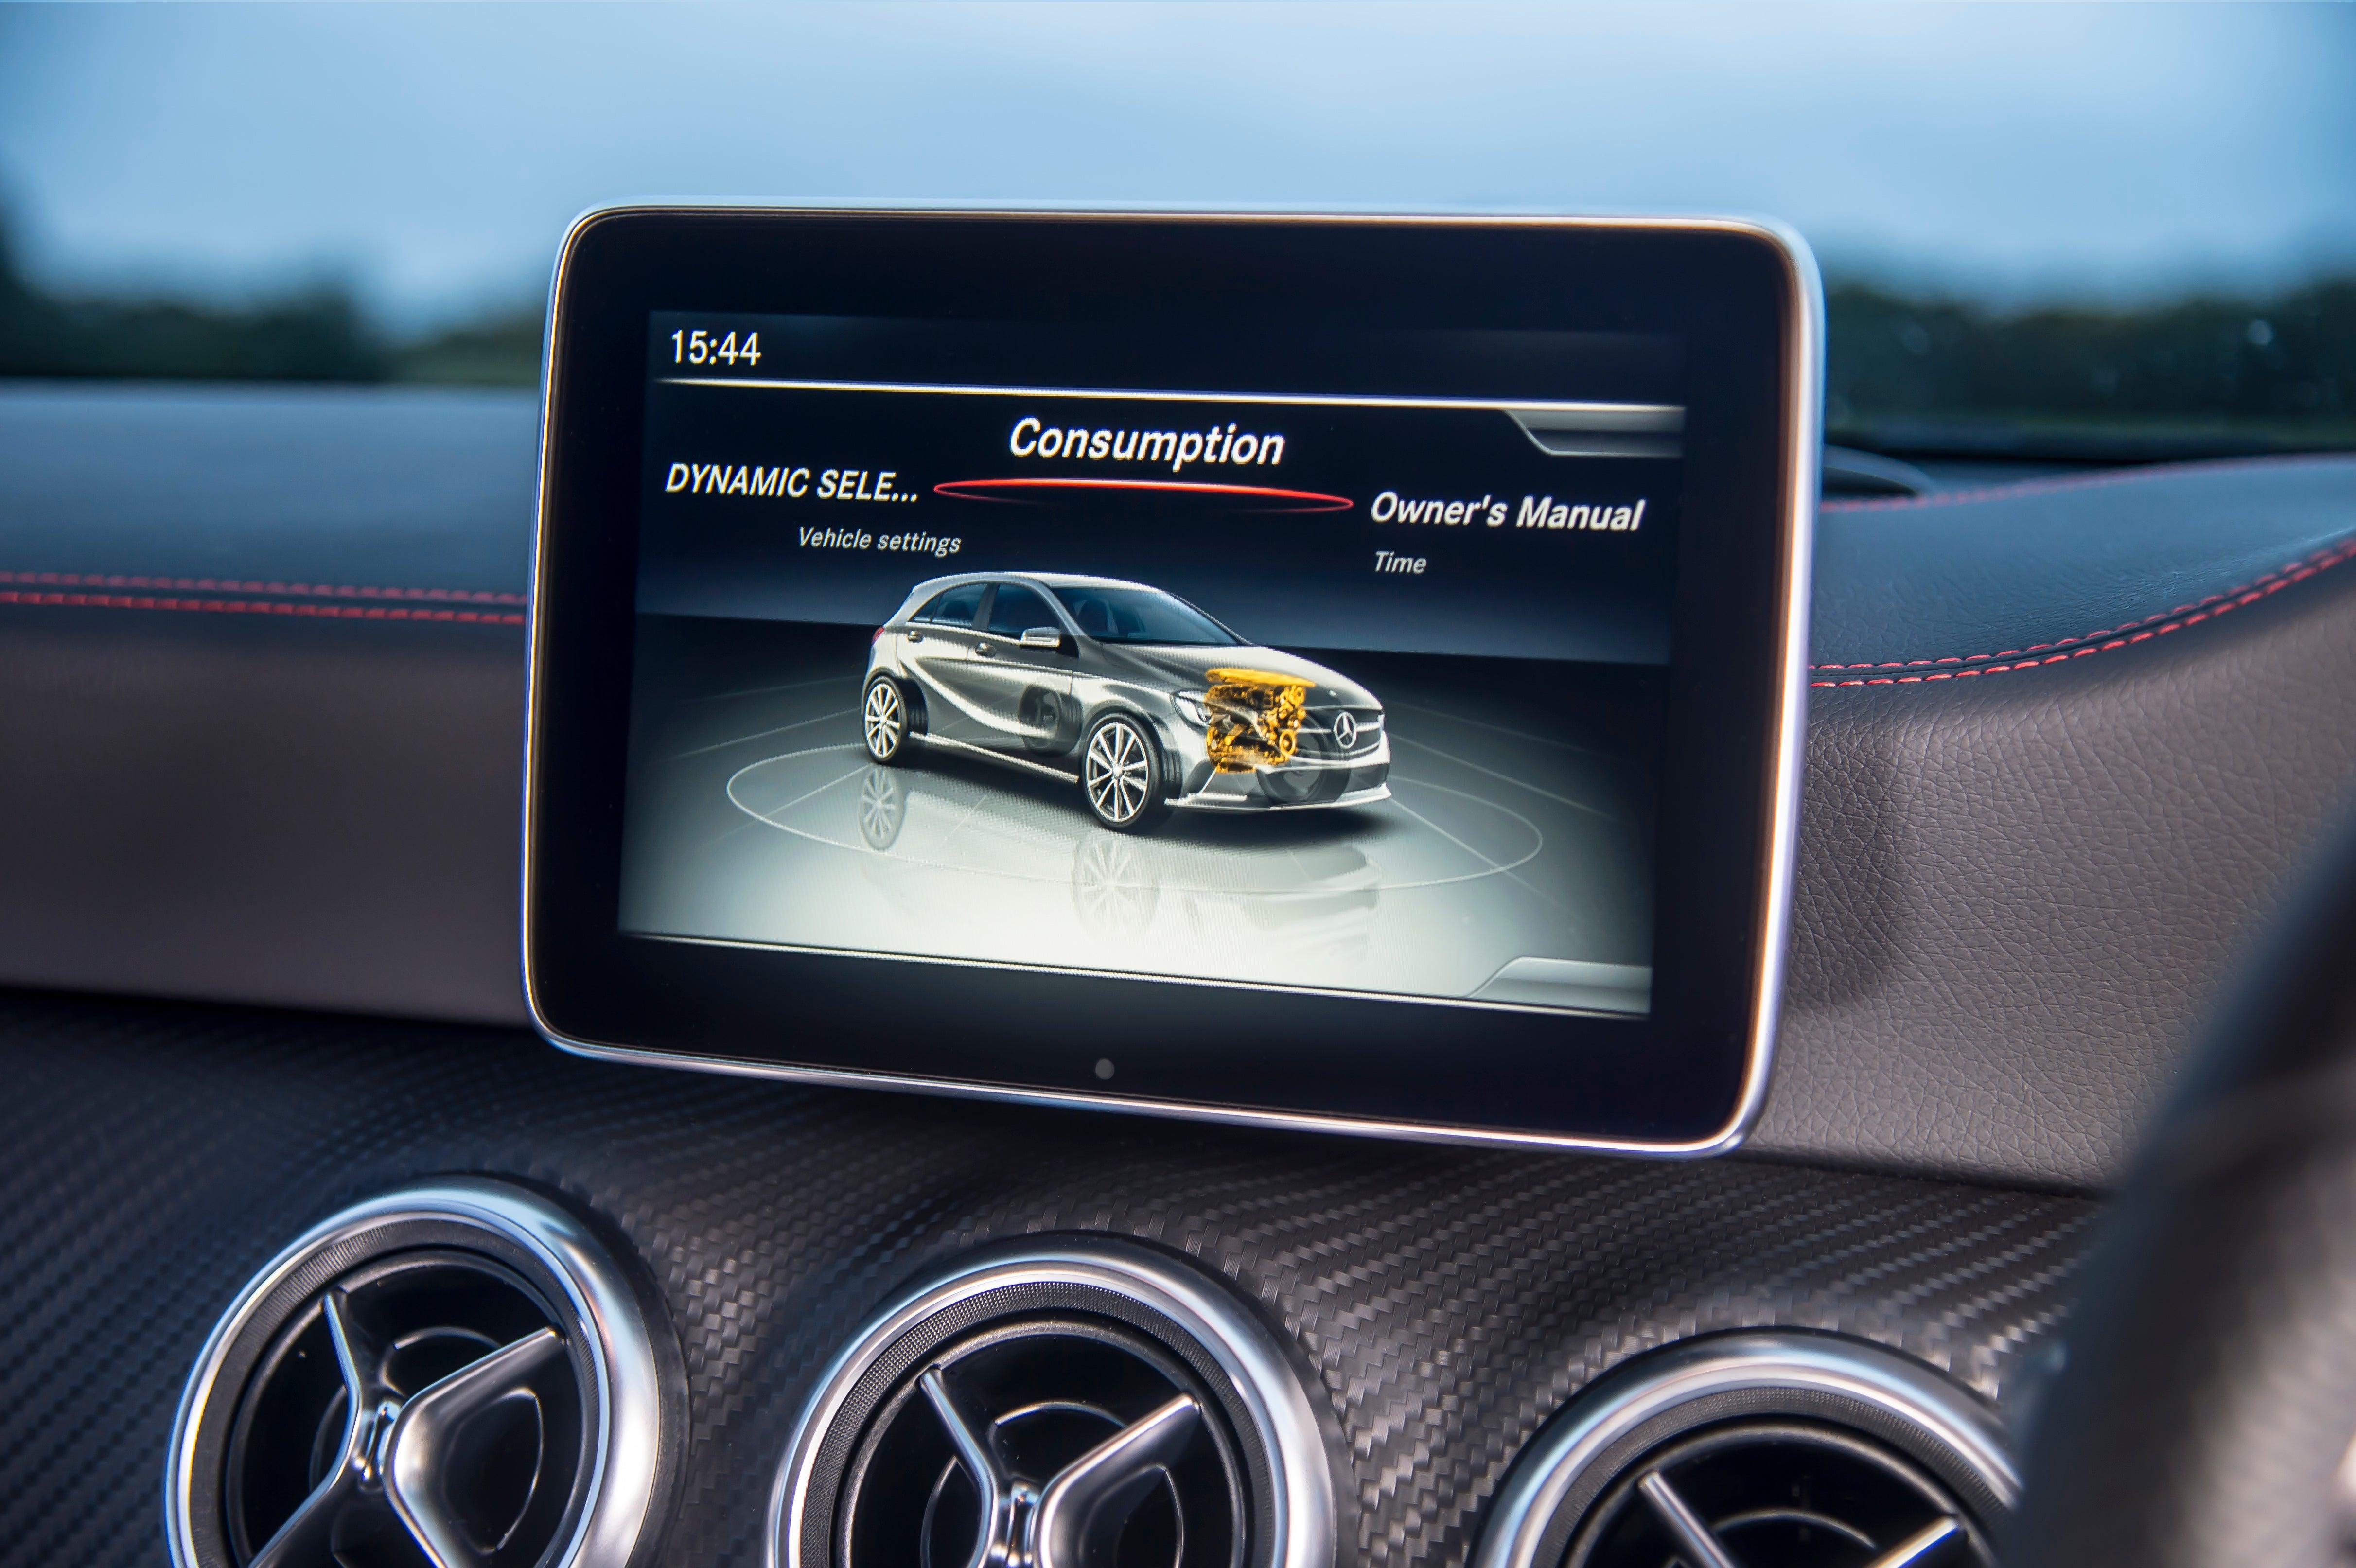 Mercedes A-Class central console